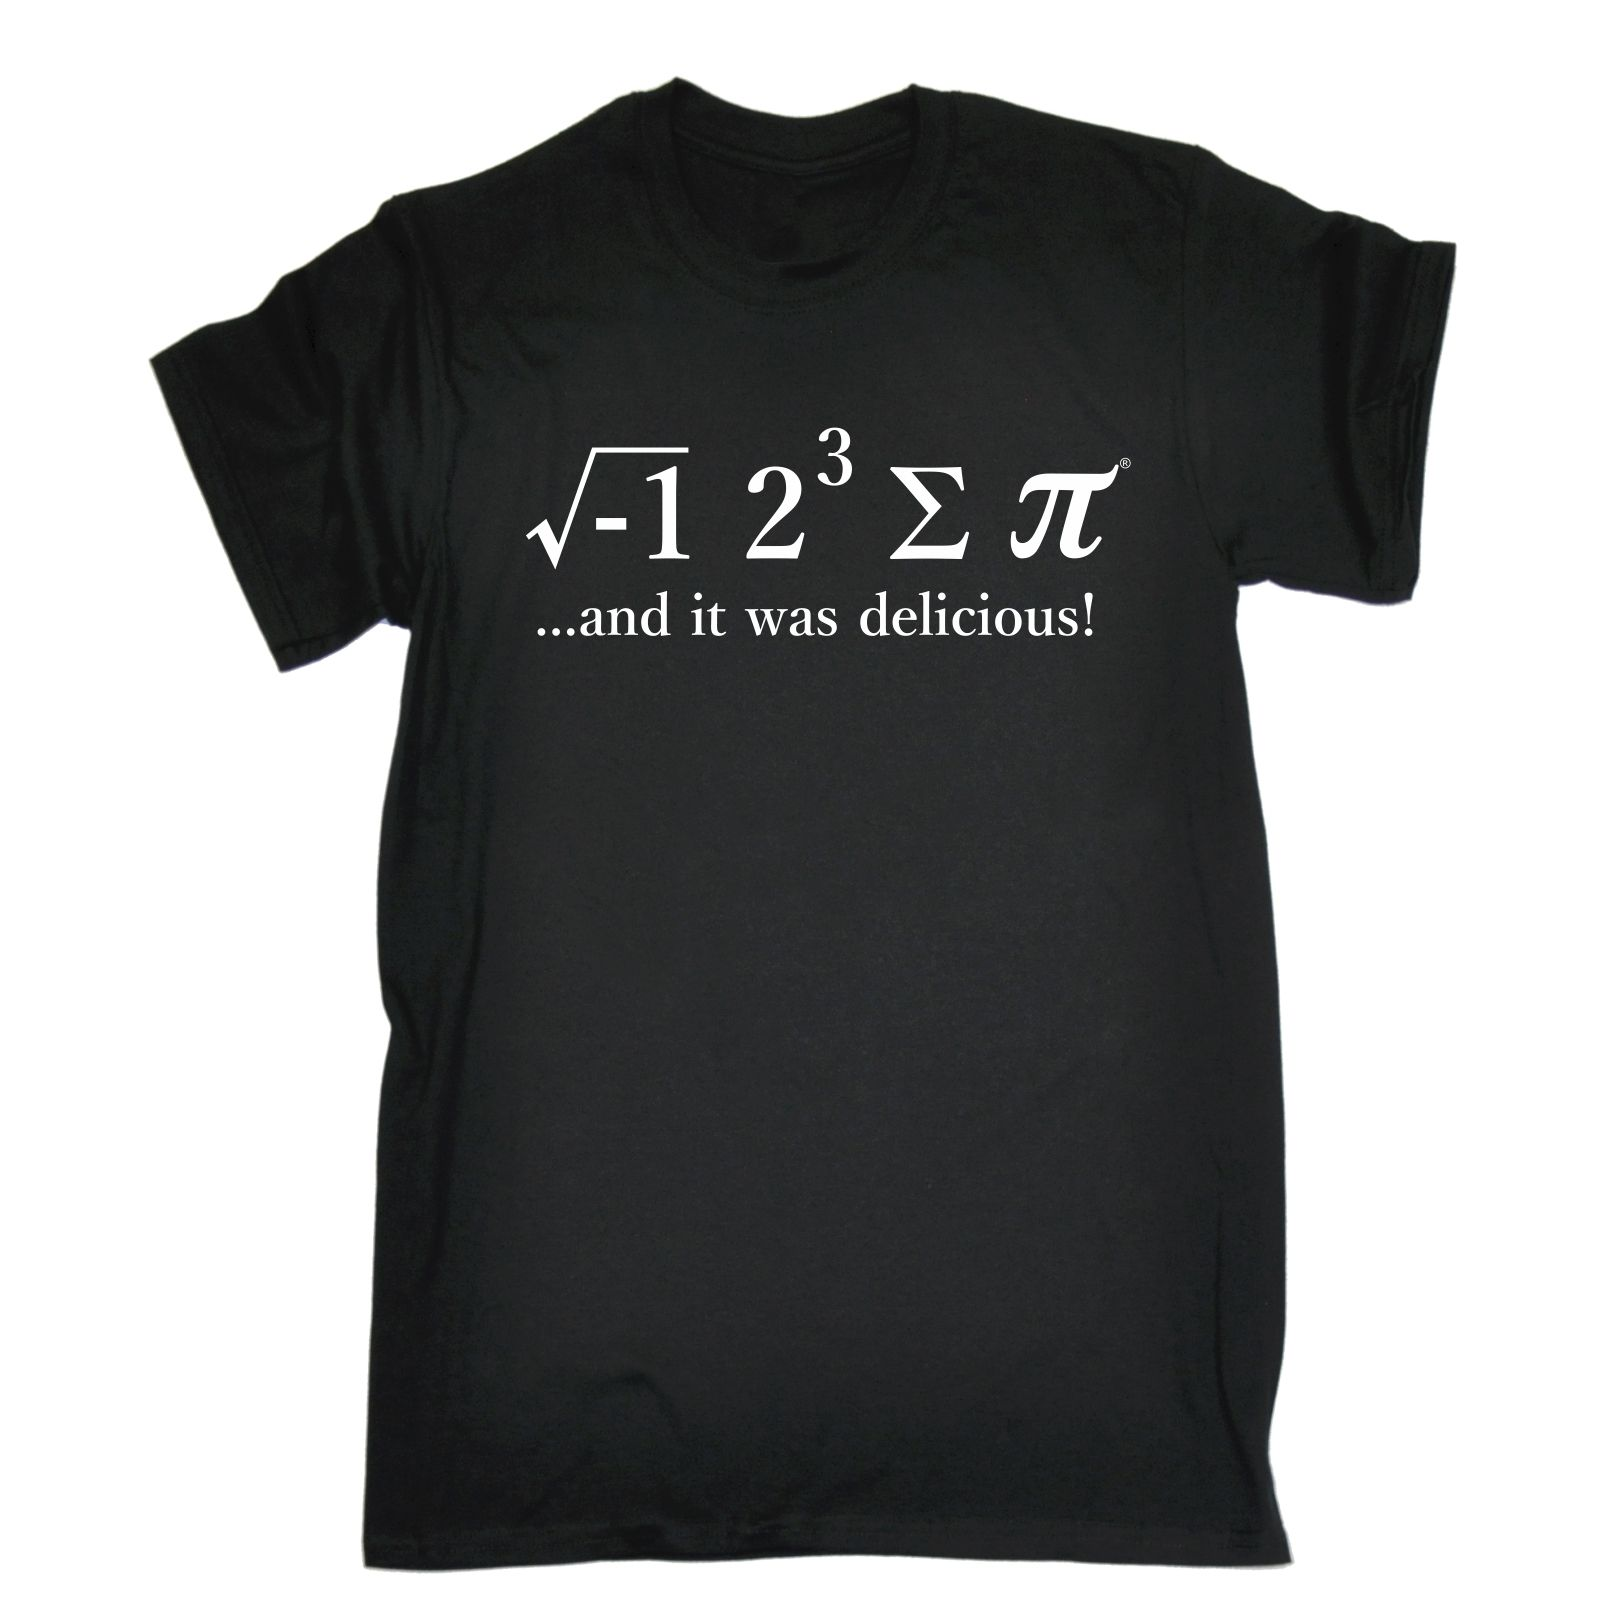 I Ate Some Pi T-SHIRT 8 Sum Pie Teacher Maths Geek Tutor Funny Gift Birthday Print T Shirts Man Short Sleeve T Shirt